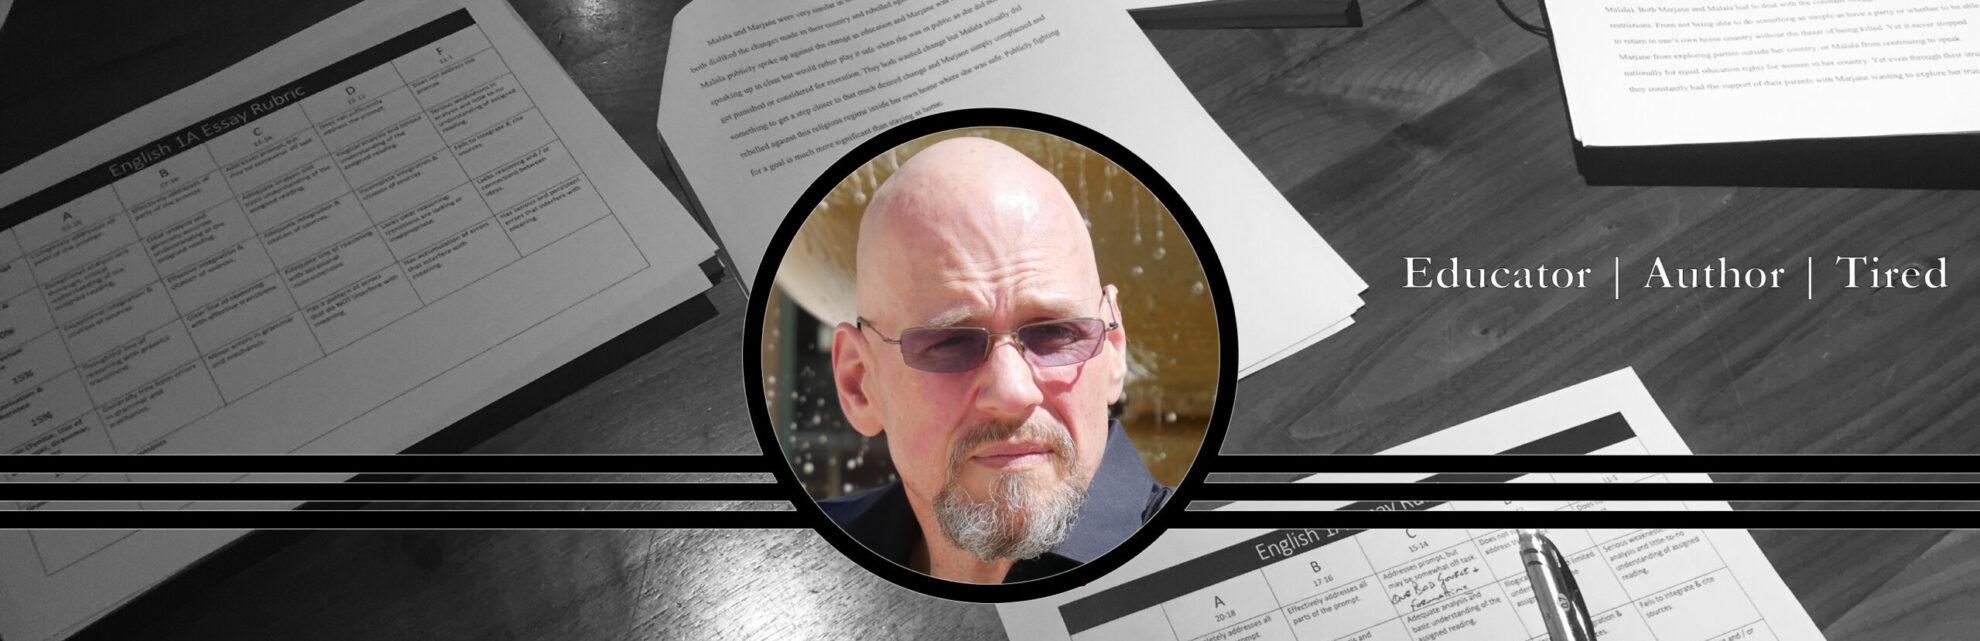 Tim Hatch: Educator. Author. Tired.